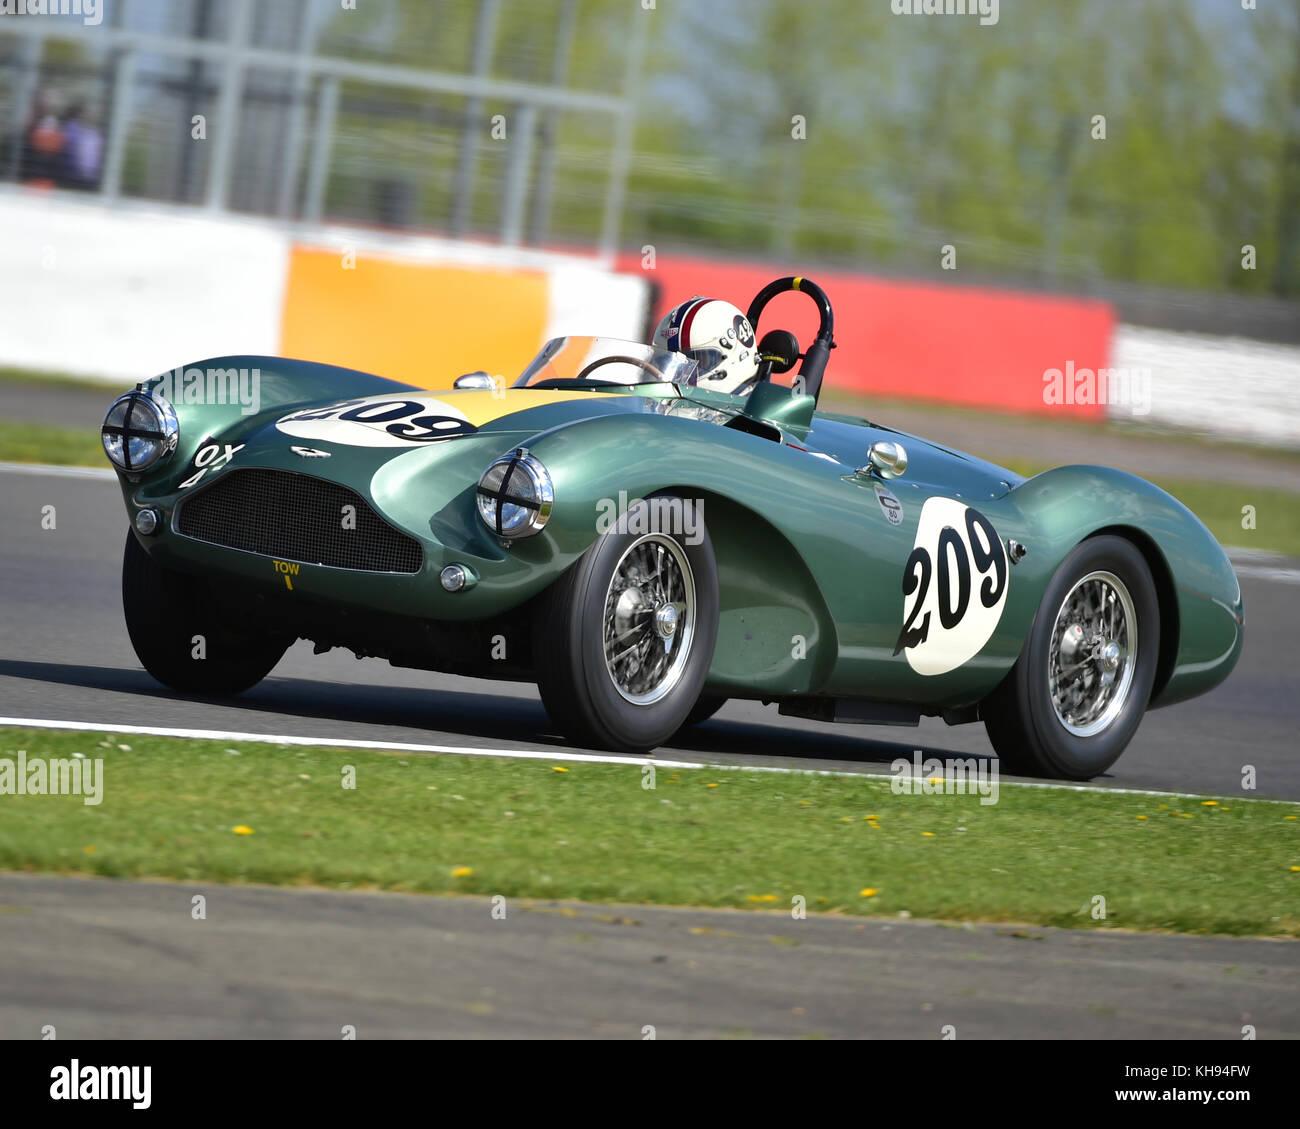 Steven boultbee - Brooks, Aston Martin DB 3 s, fiscar, Tom Cole Trophäe, vscc, Formel vintage, Runde 1, Silverstone, Stockbild